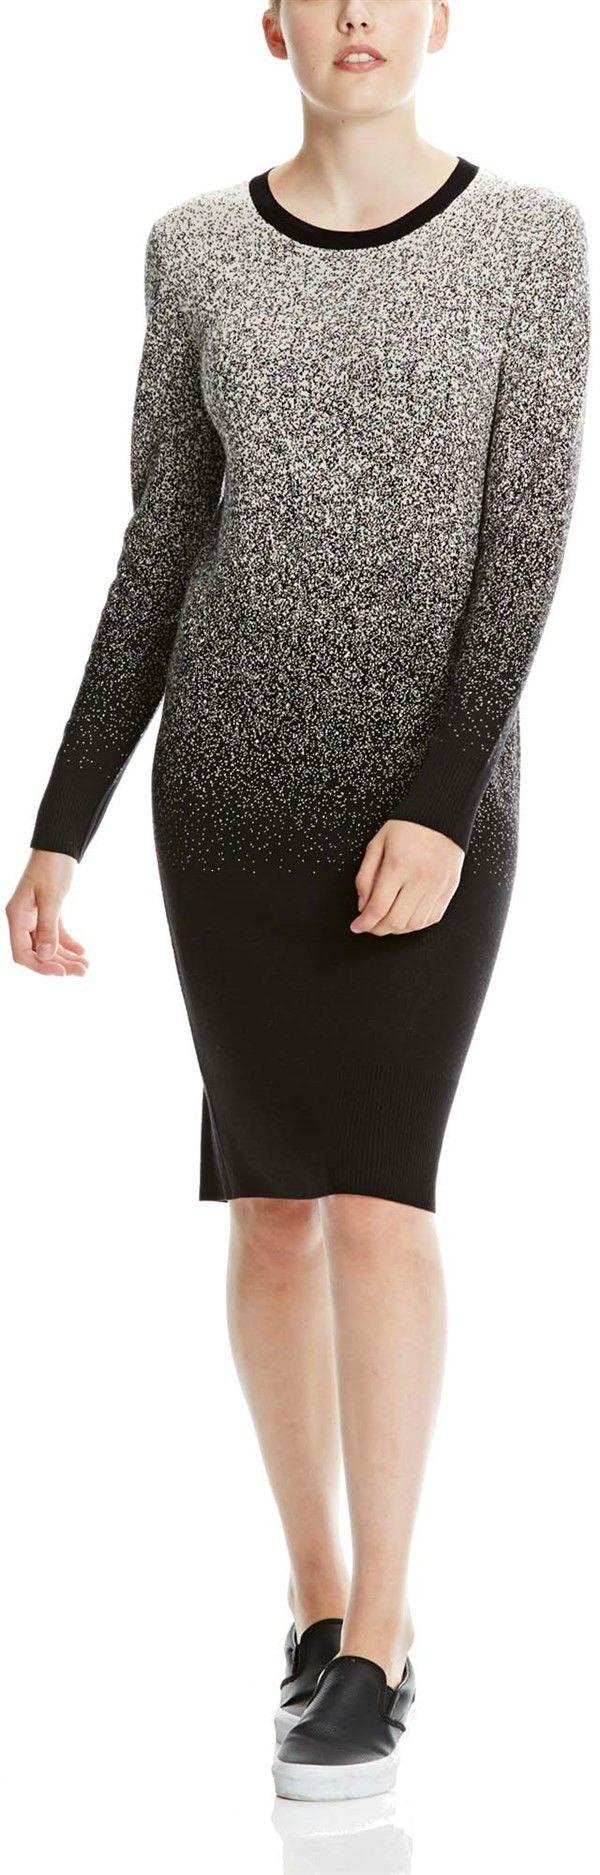 sukienka BENCH - Dress Black (BK022)